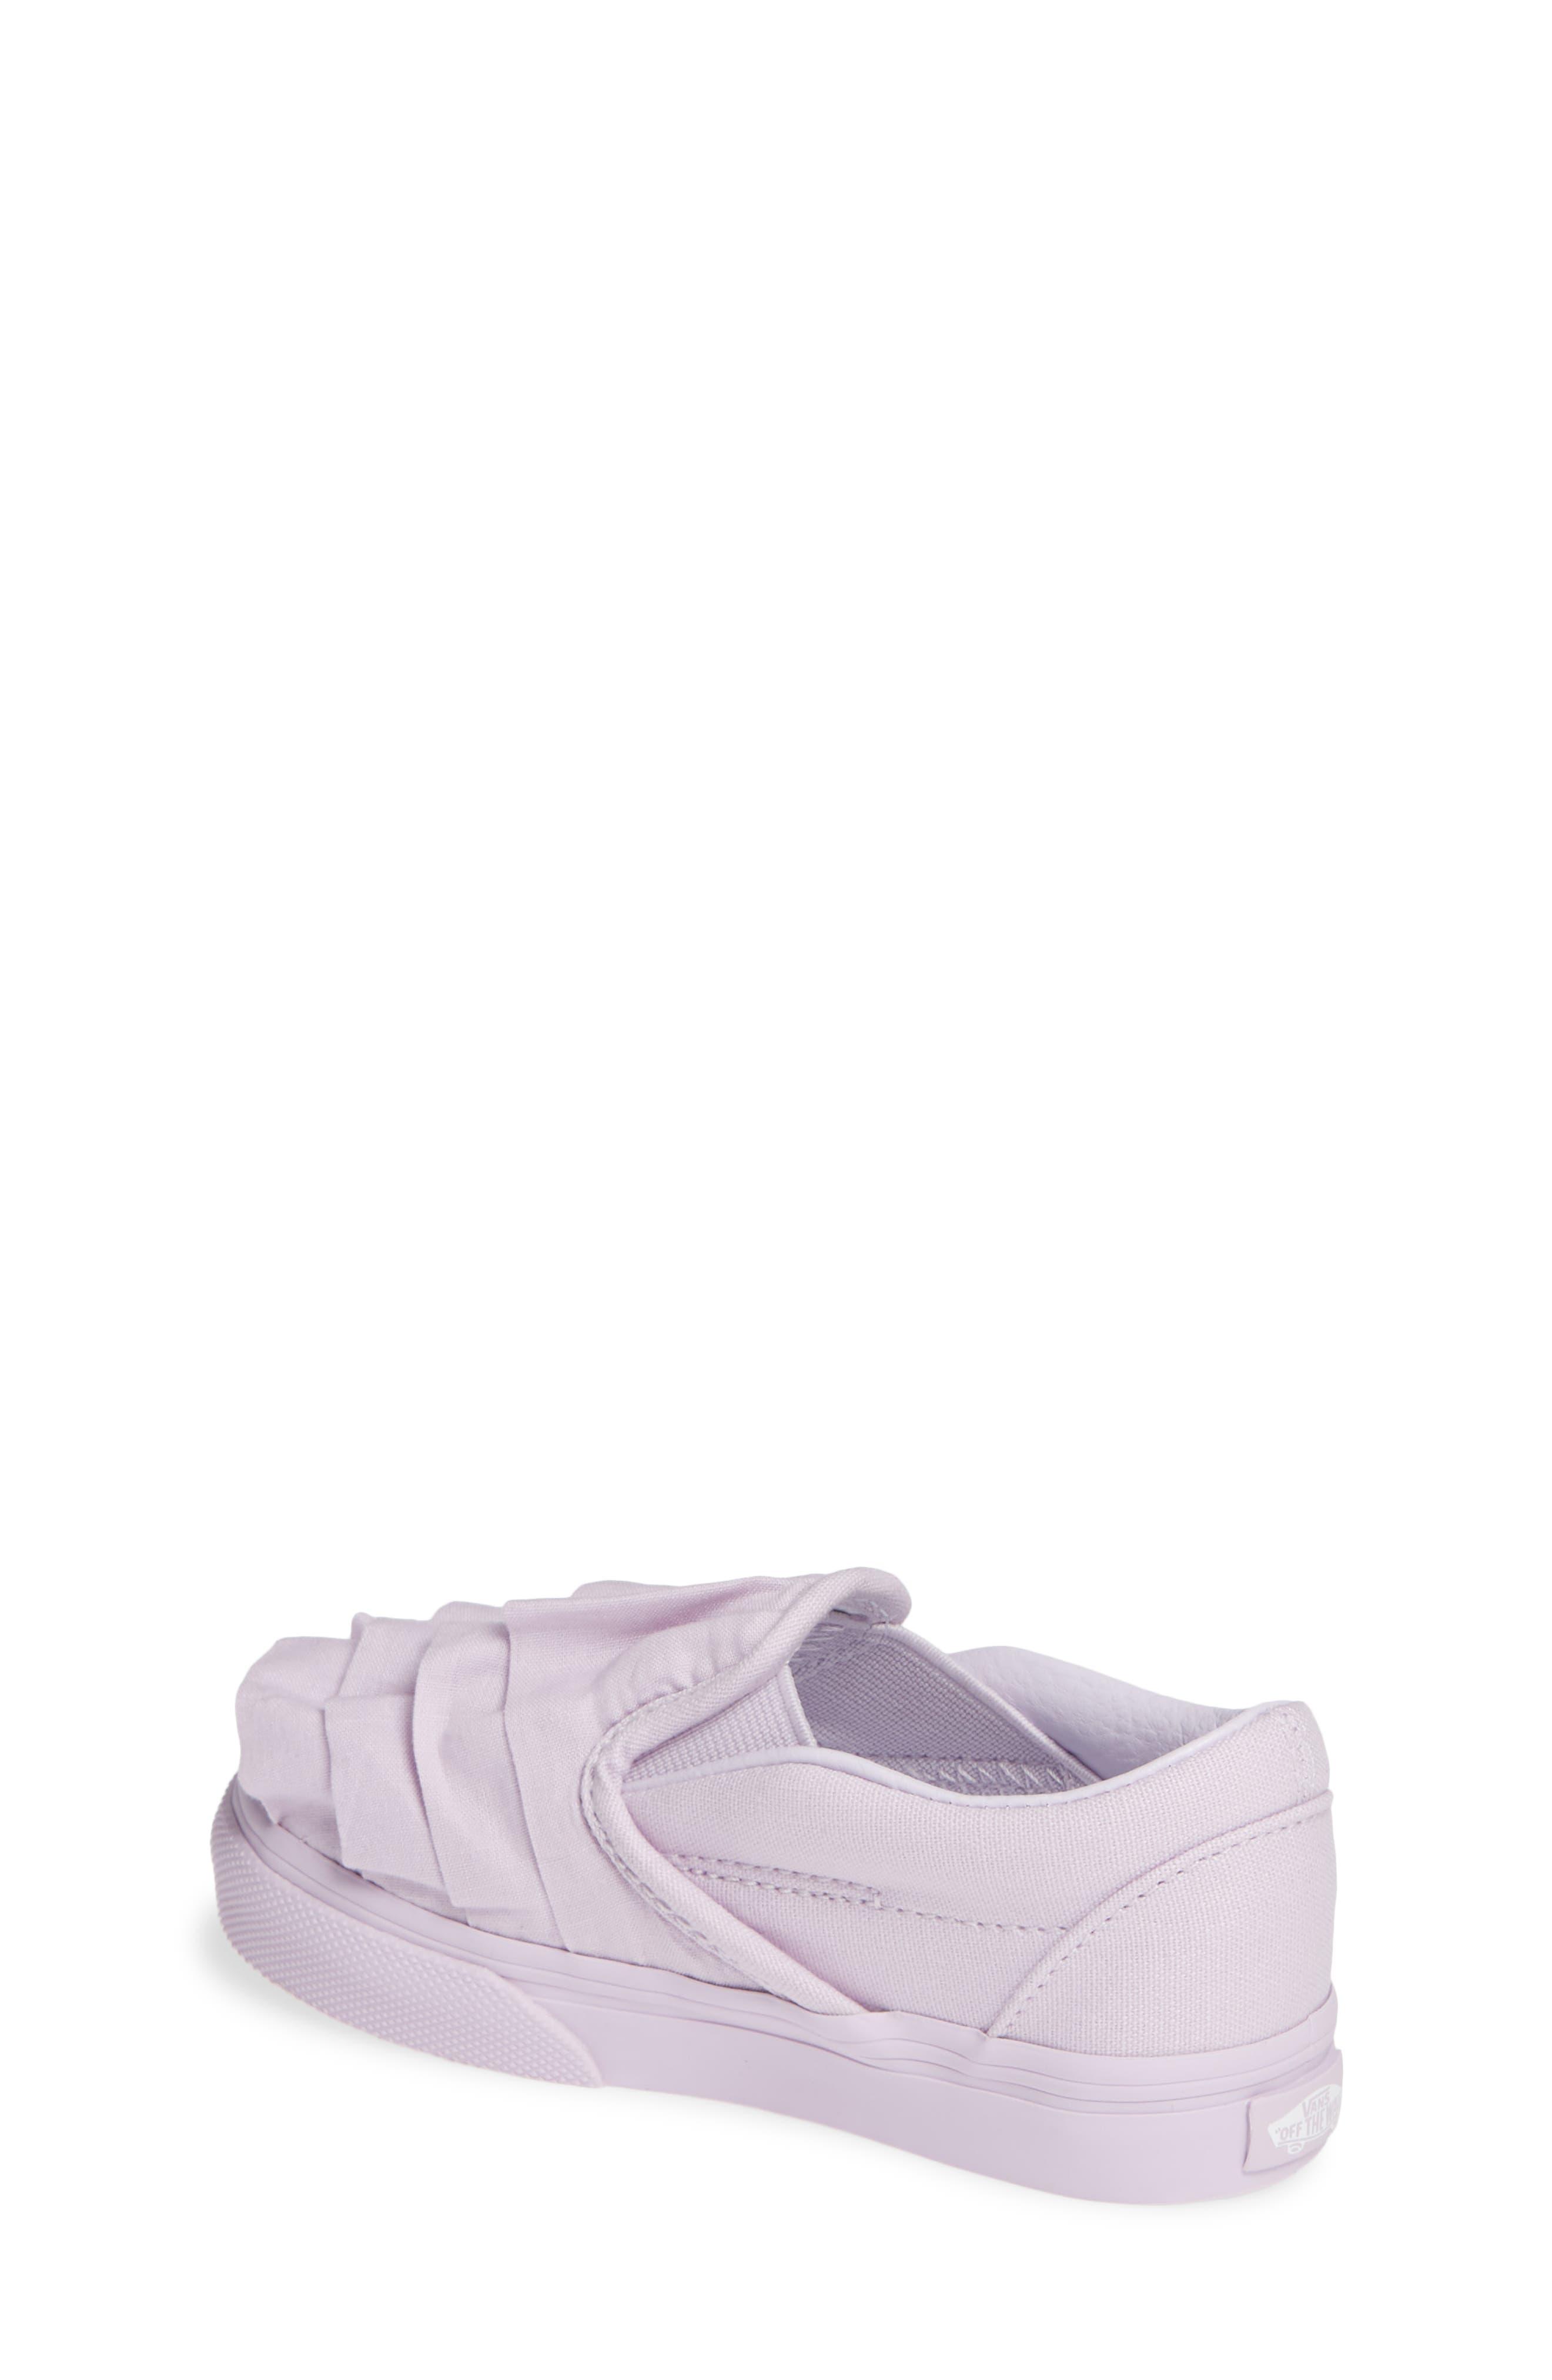 Ruffle Classic Slip-On Sneaker,                             Alternate thumbnail 2, color,                             530